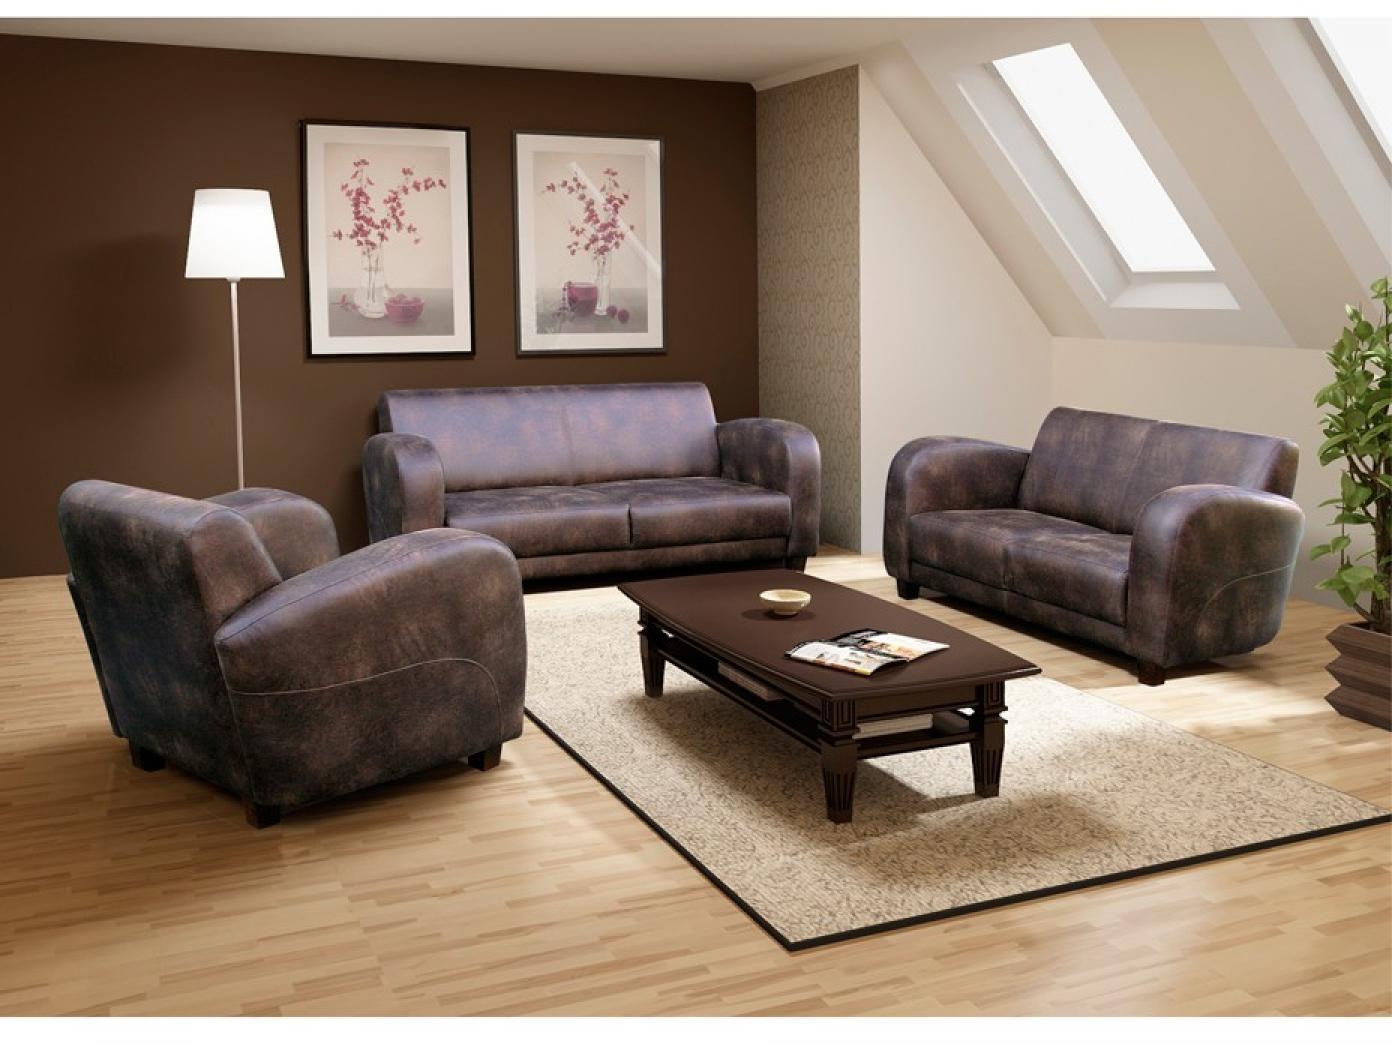 photos canap imitation cuir vieilli. Black Bedroom Furniture Sets. Home Design Ideas